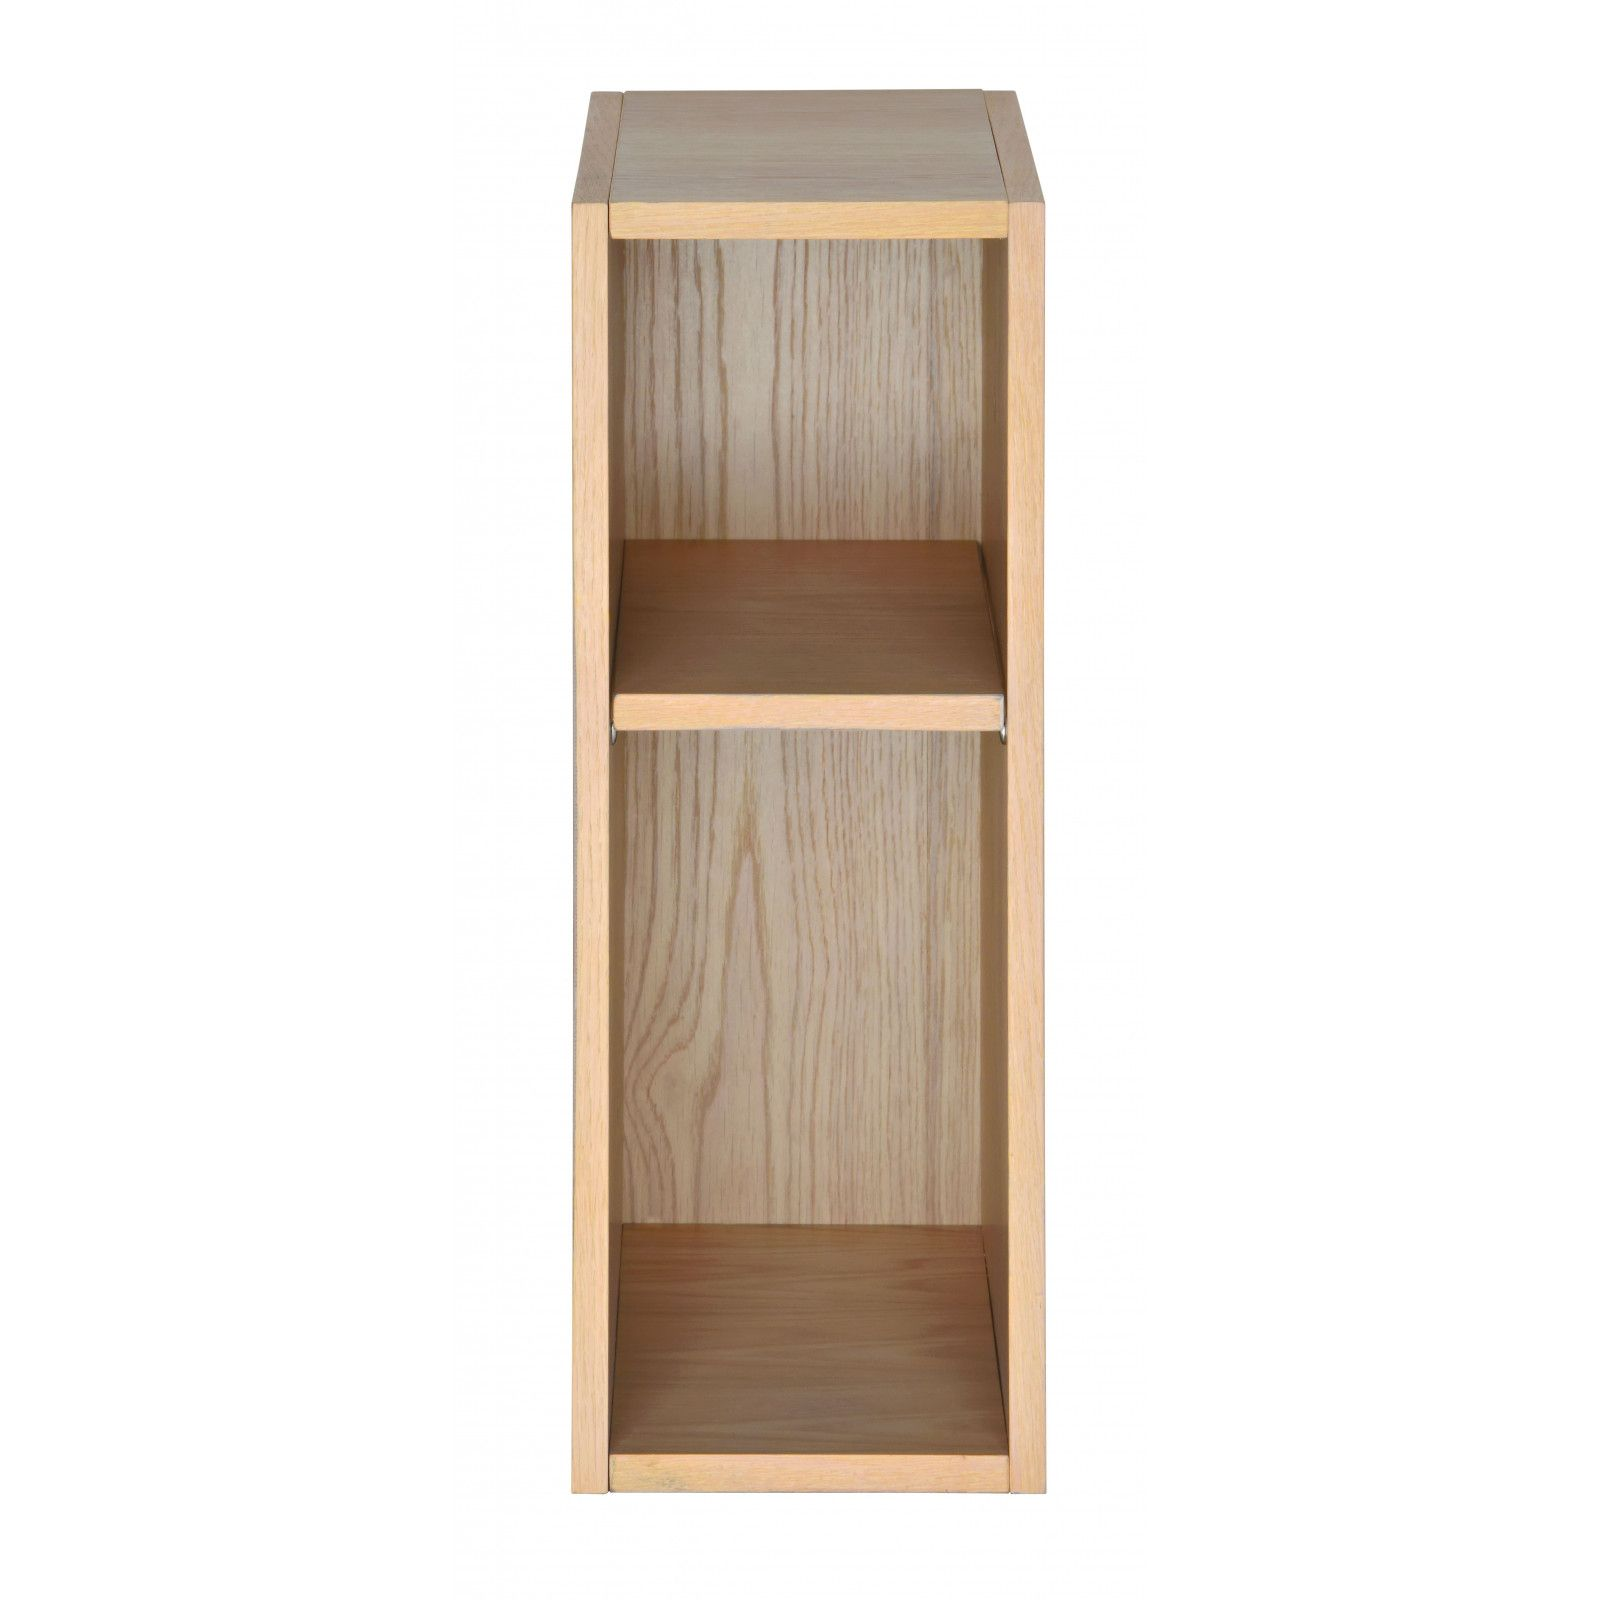 Ensemble salle de bain chêne 140 cm meuble + vasque + 2 miroirs ENIO